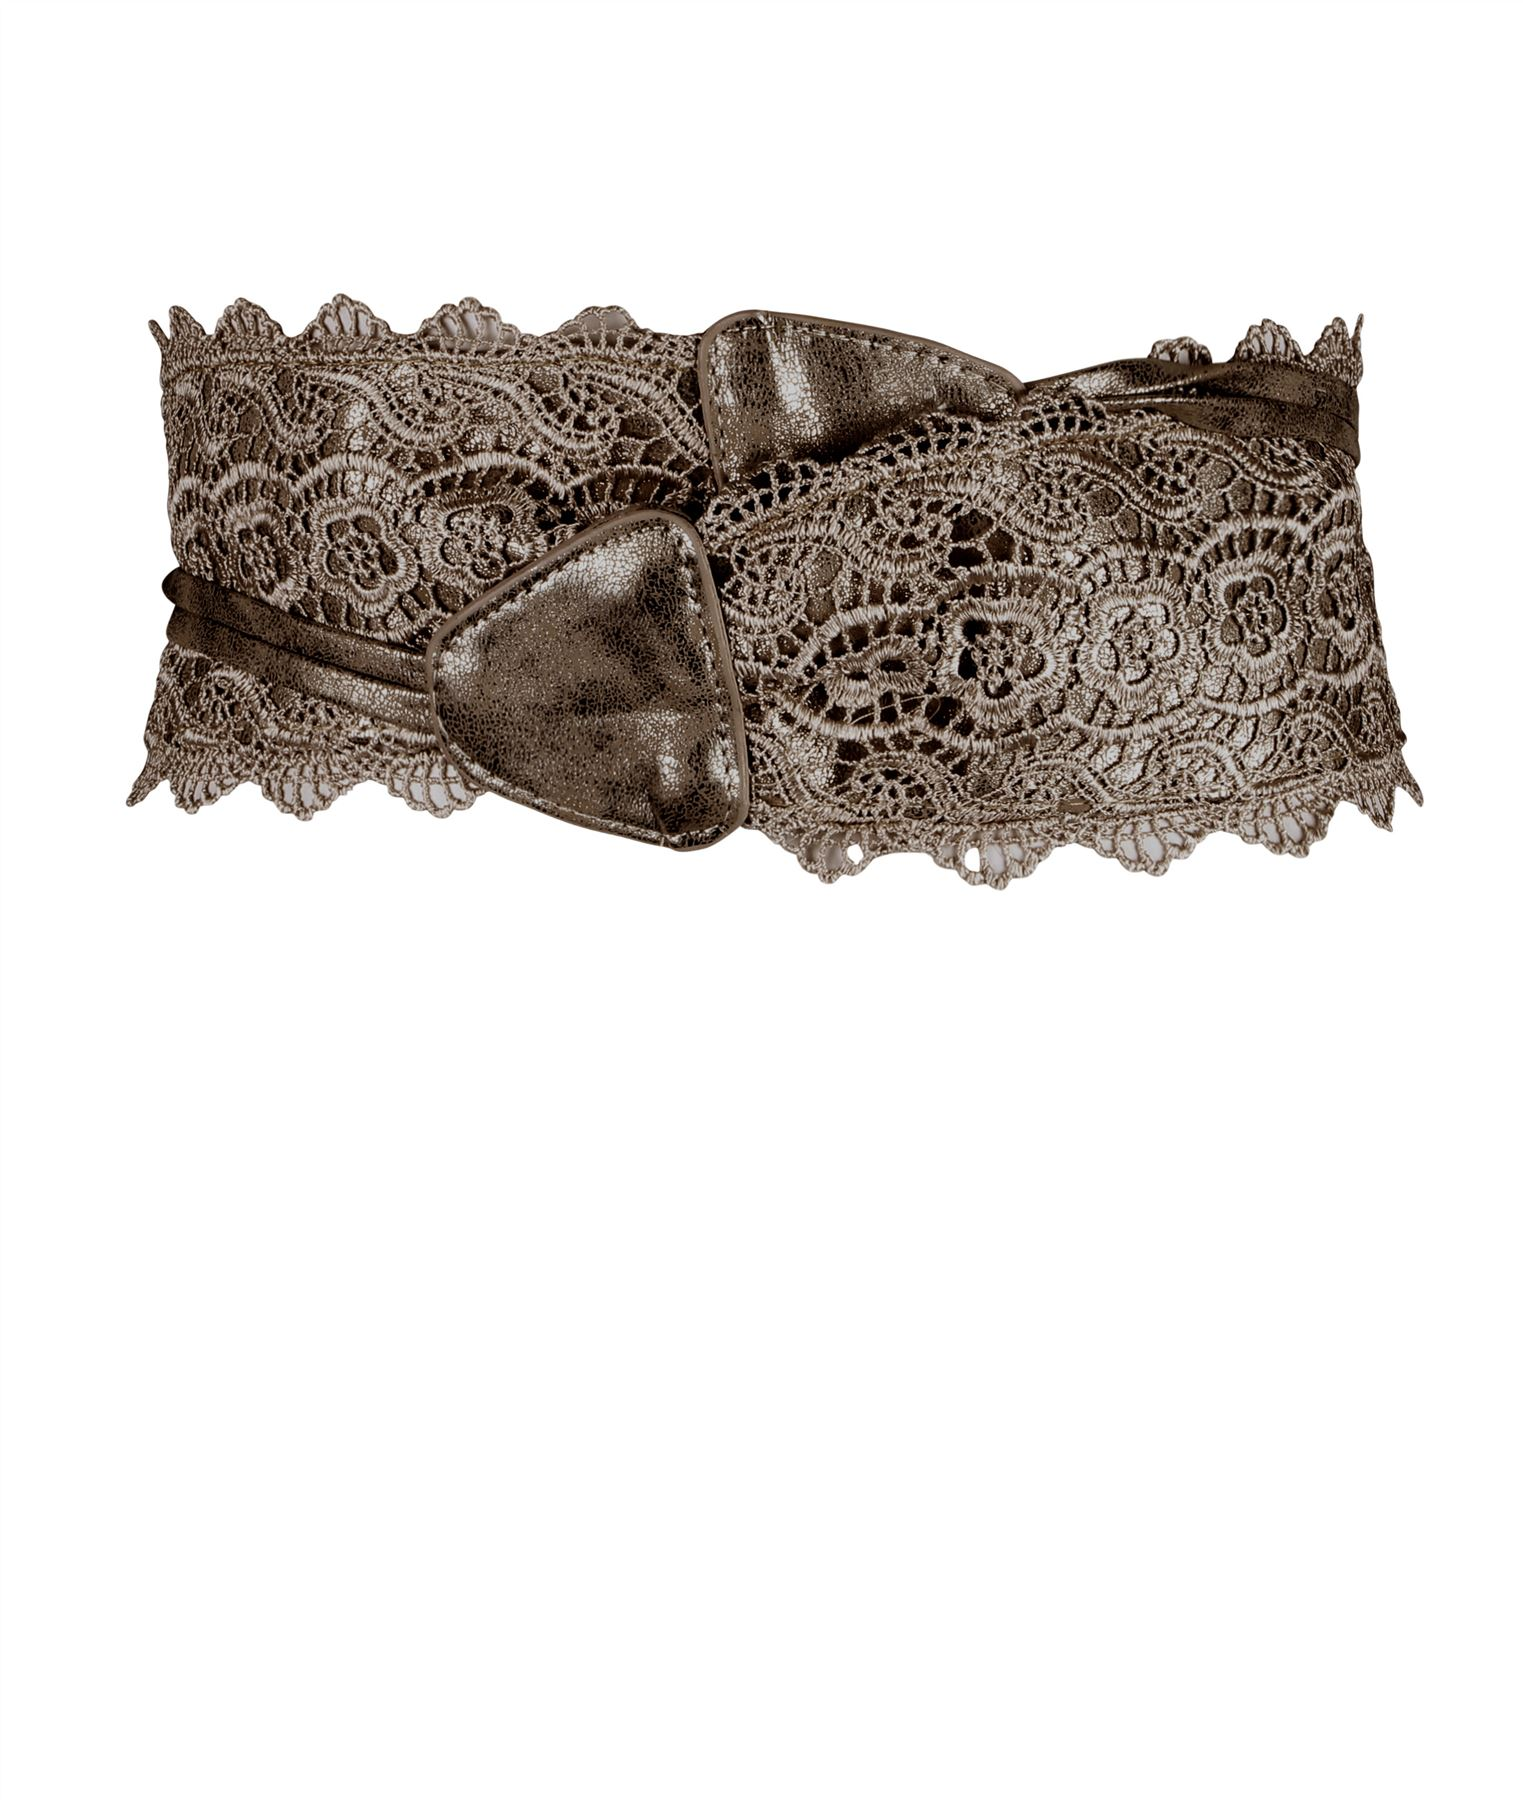 thumbnail 8 - Womens-Ladies-Wide-Waist-Belt-Floral-Waistband-Pattern-Band-Crochet-Lace-Corset